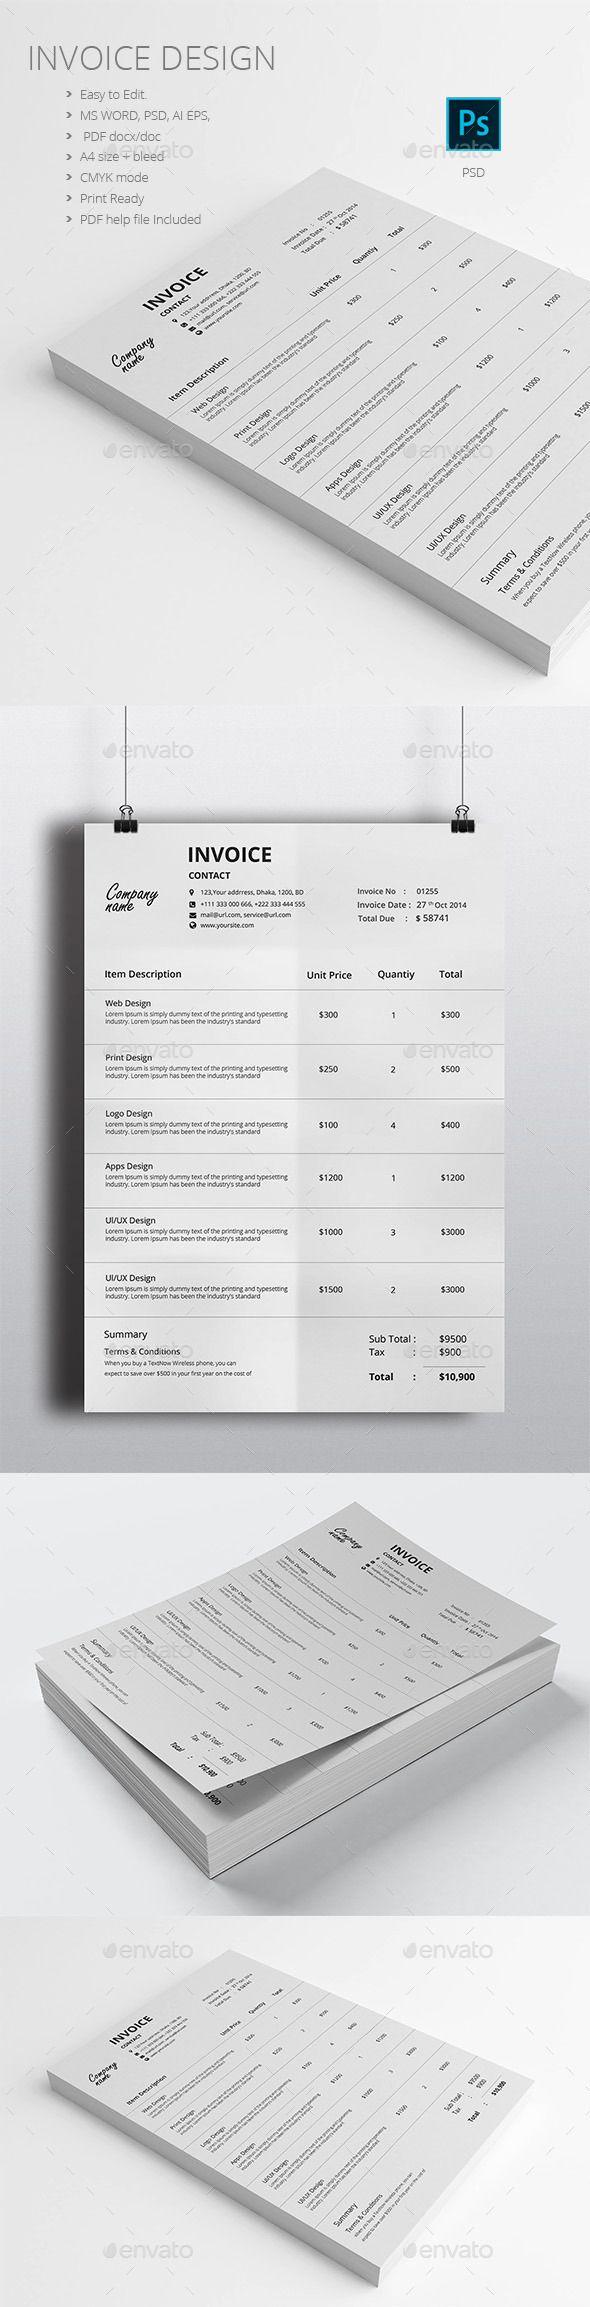 Invoice Template #design Download: http://graphicriver.net/item/invoice-design/12813980?ref=ksioks